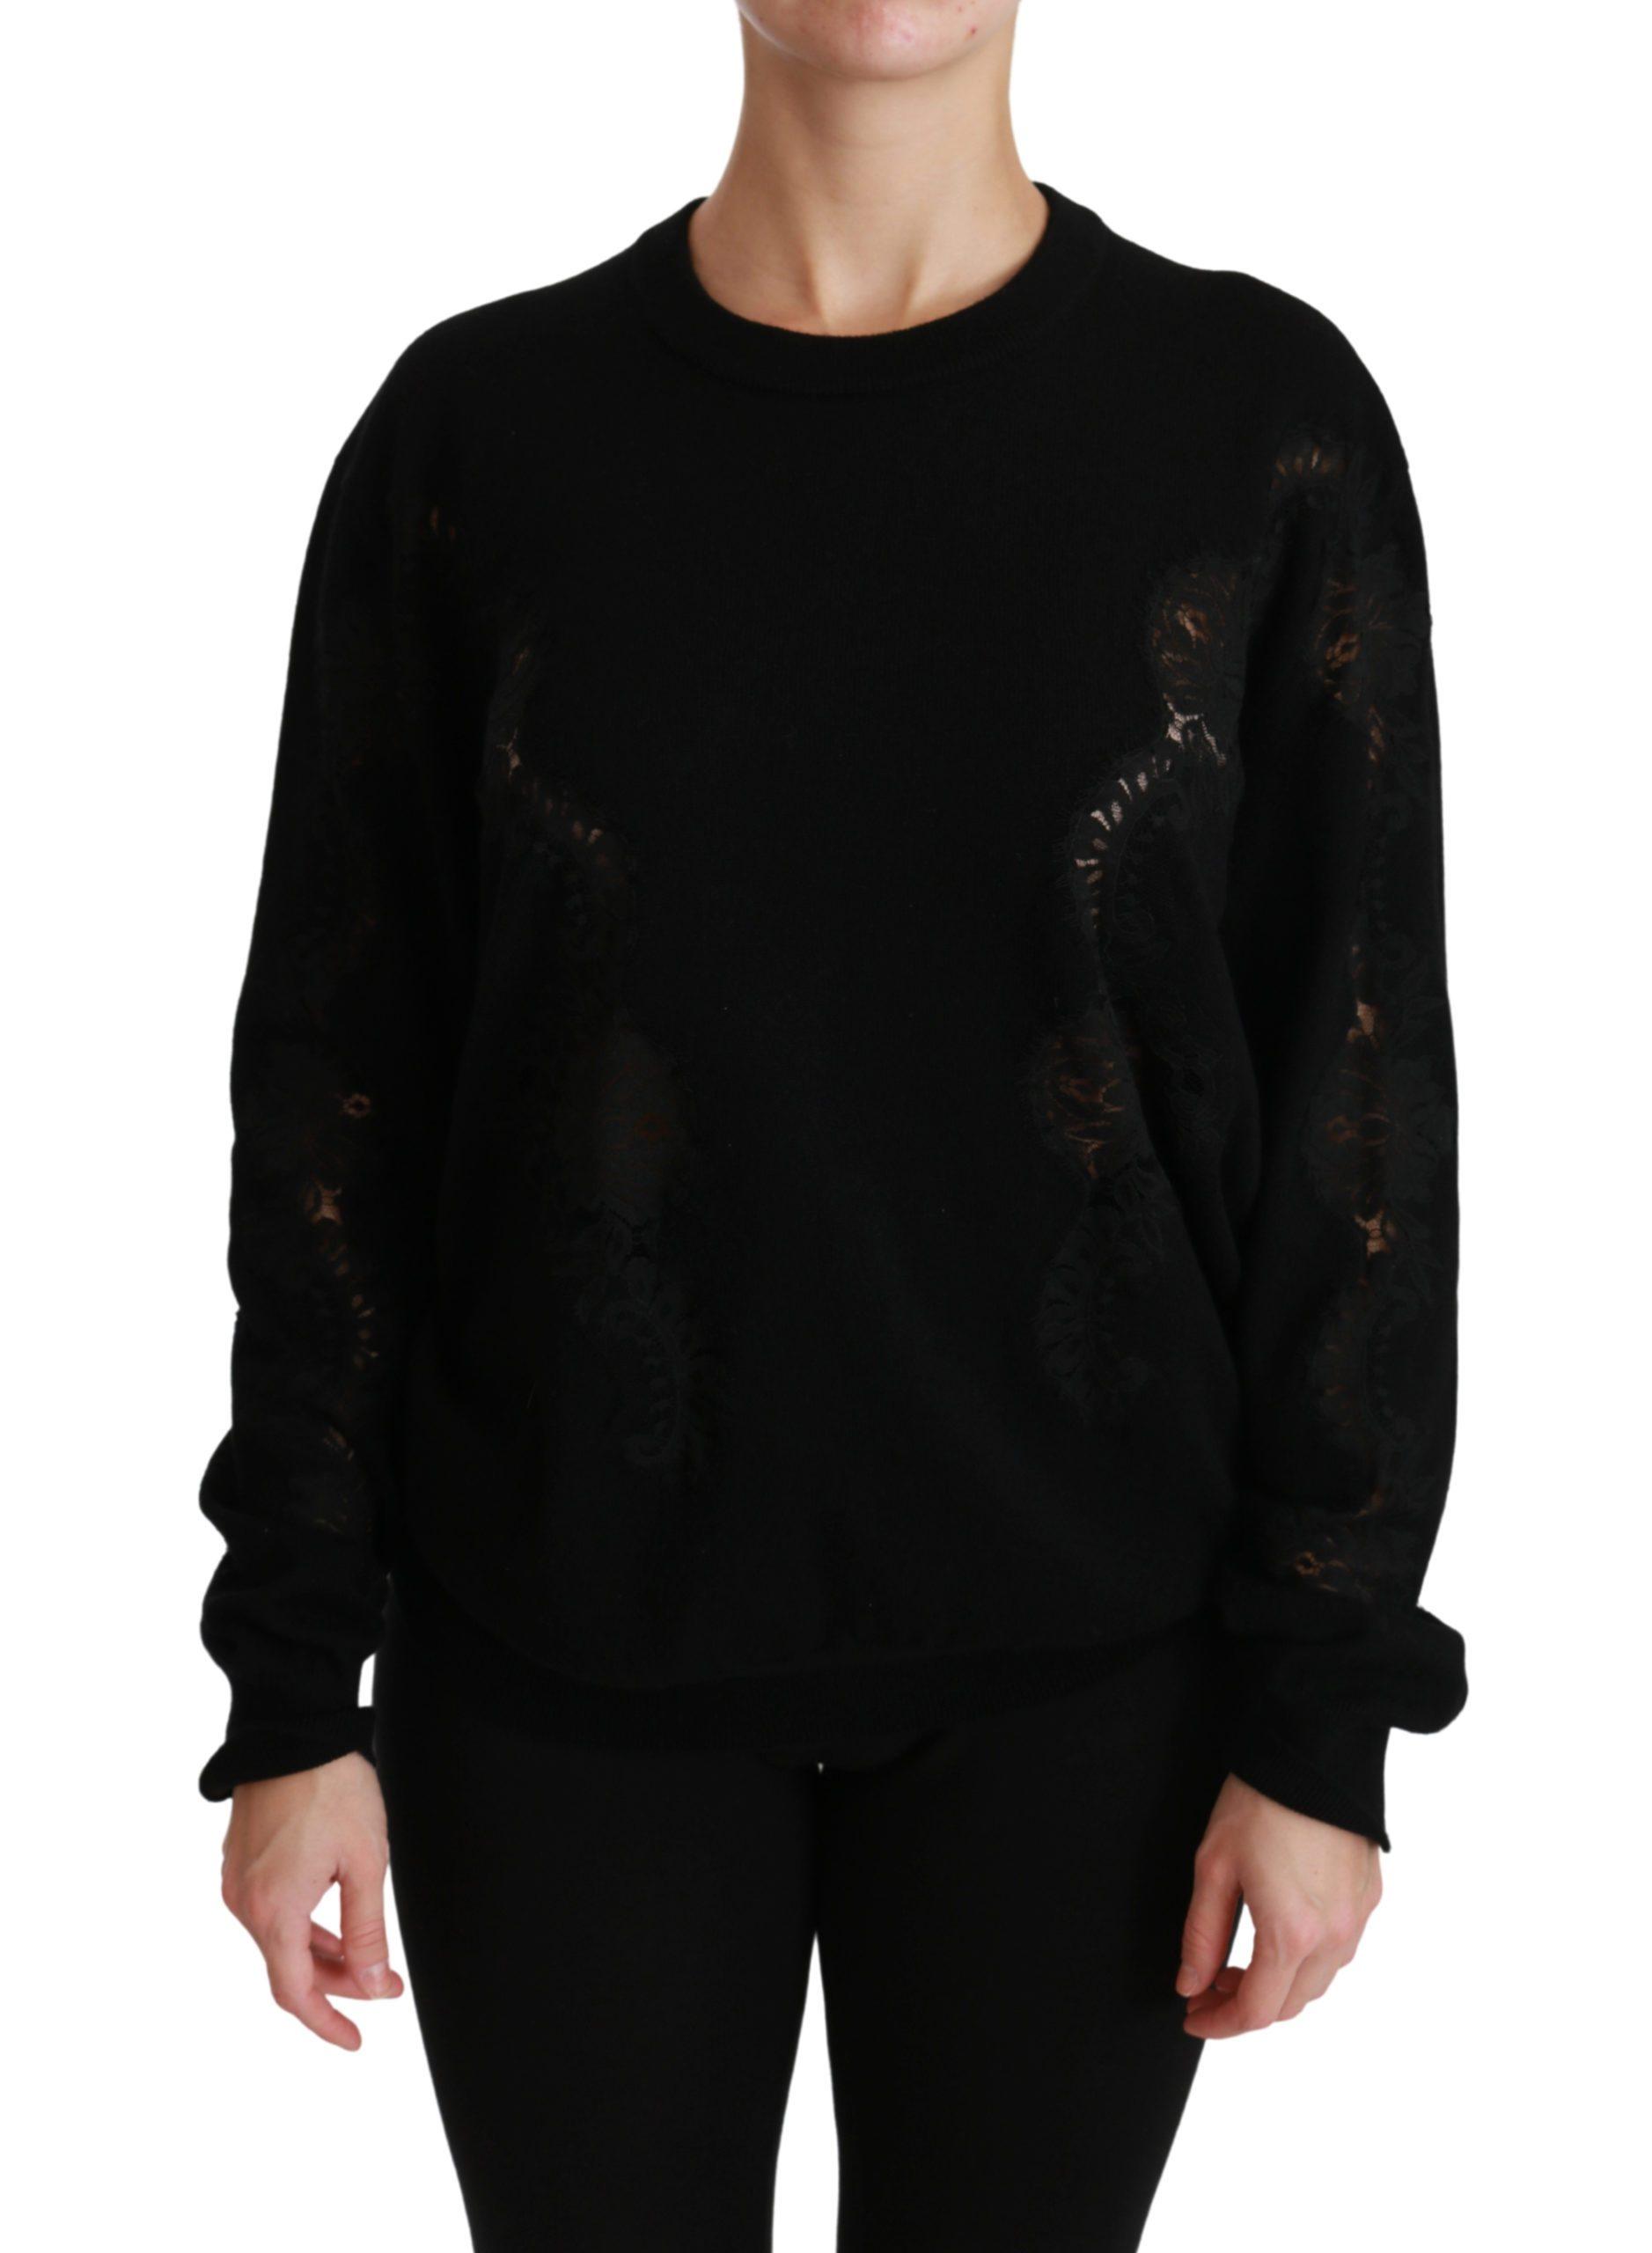 Dolce & Gabbana Women's Cashmere Floral Lace Sweater Black TSH4421-46 - IT46|XL